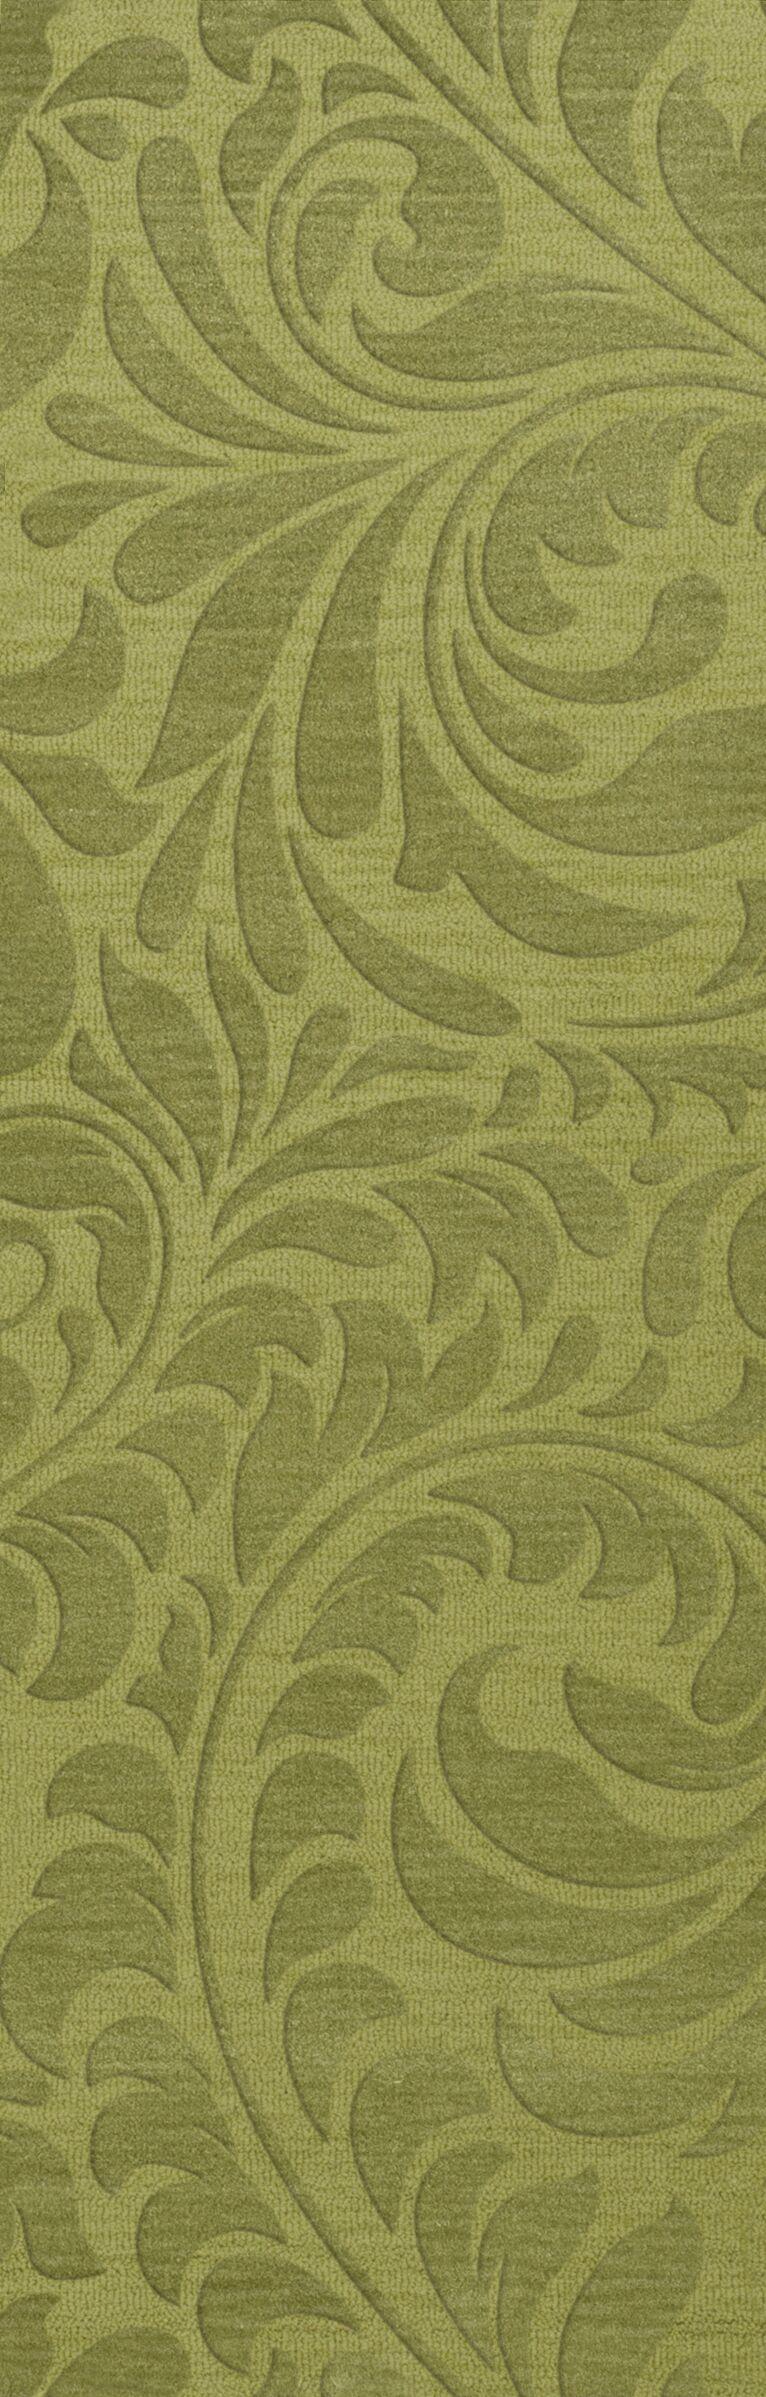 Bella Machine Woven Wool Green Pad Area Rug Rug Size: Runner 2'6